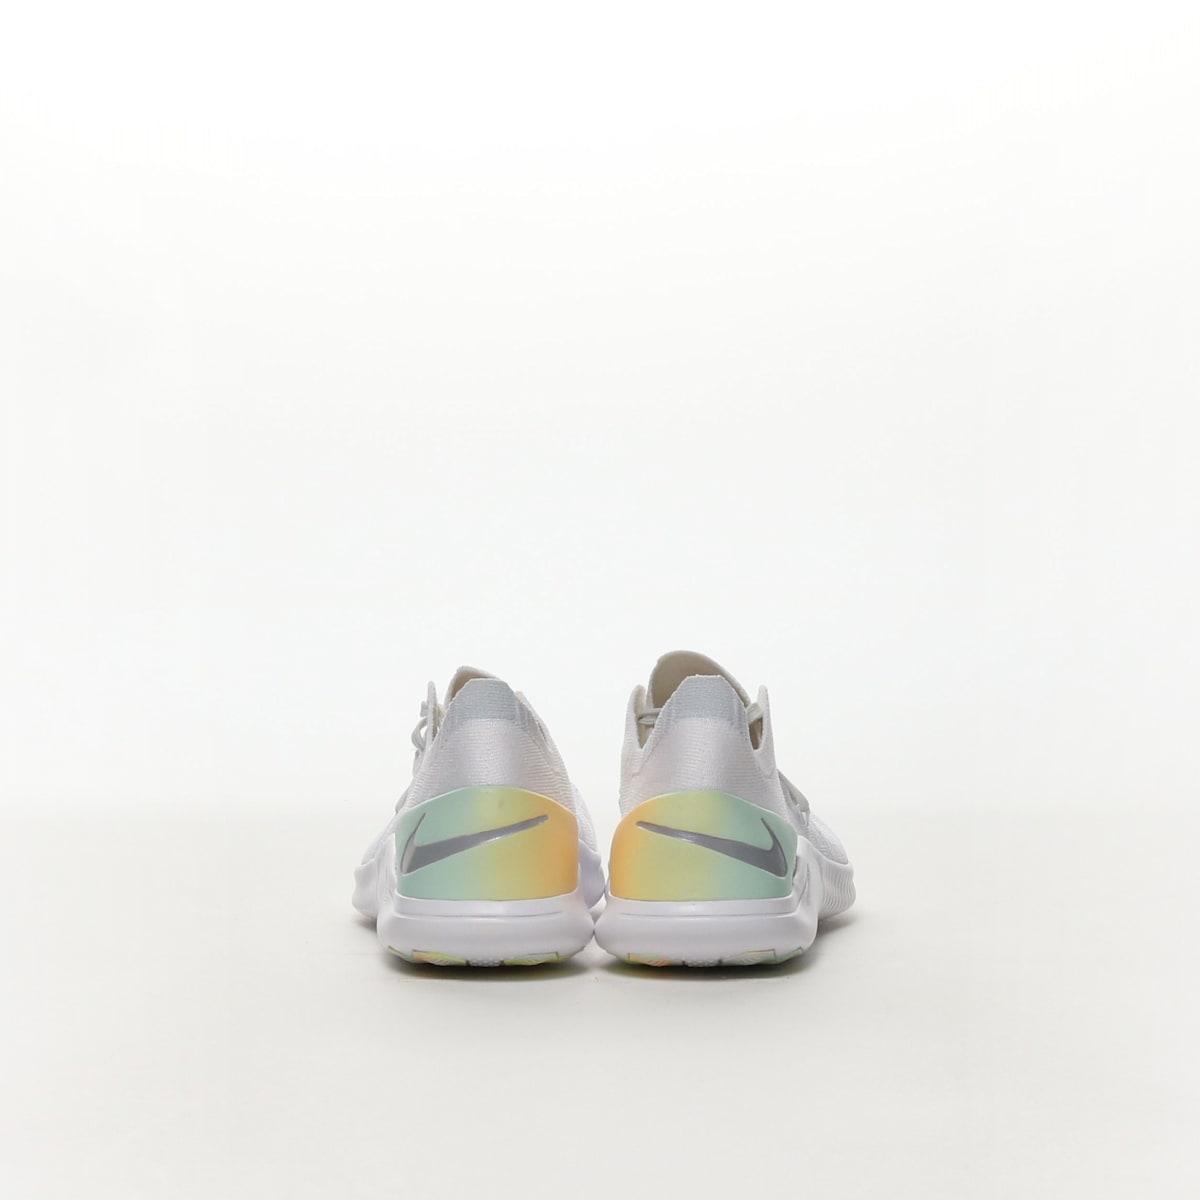 03f7e6f3f4a2 Nike Free TR Flyknit 3 Rise Women s Training Shoe - WHITE SUMMIT ...